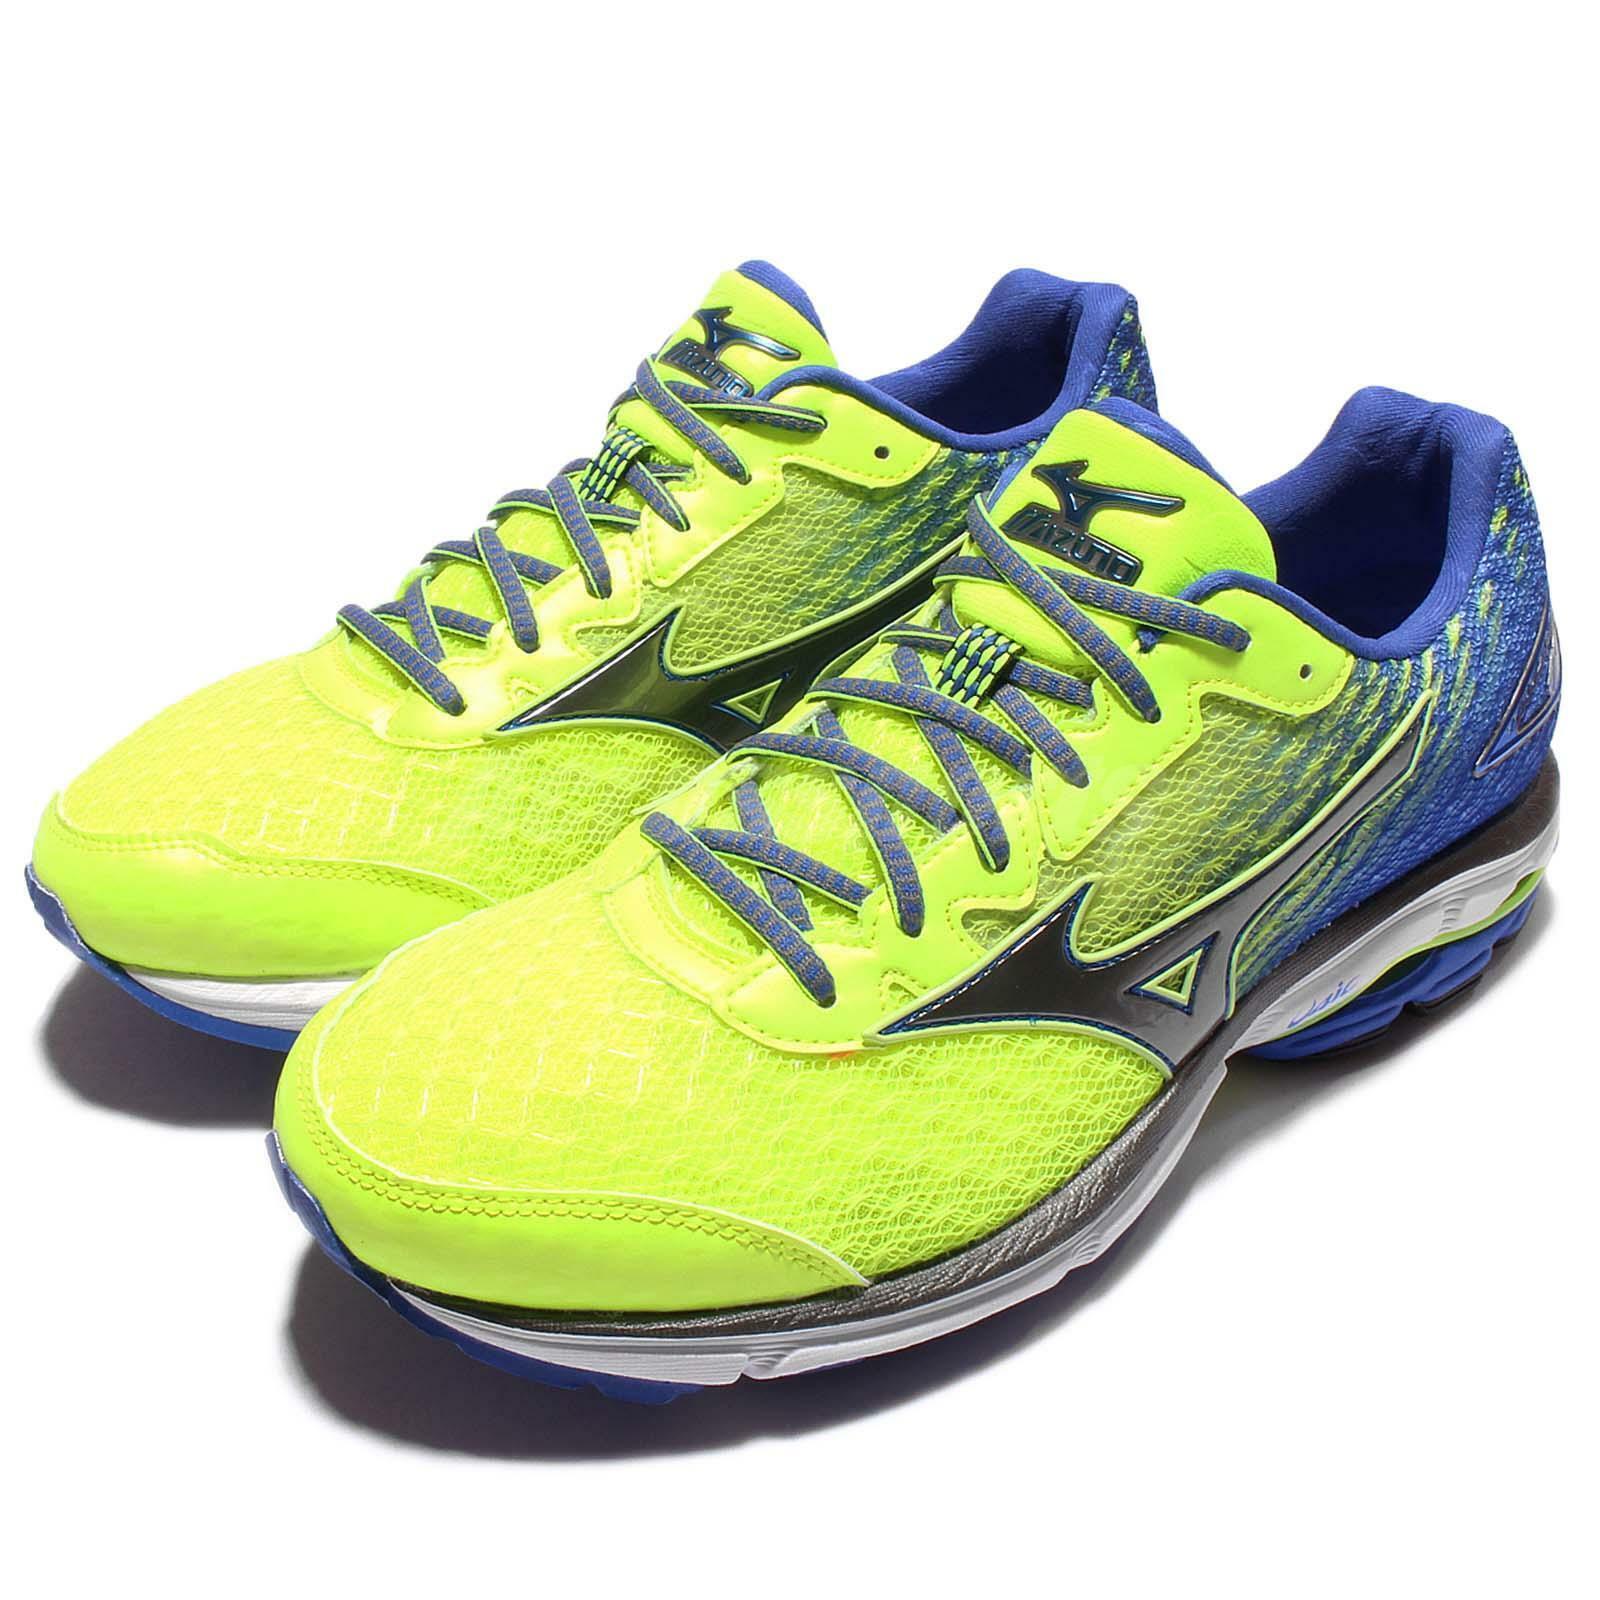 Mizuno Wave Rider 19 2E grand vert bleu Hommes FonctionneHommest Trainers chaussures J1GC16-0490